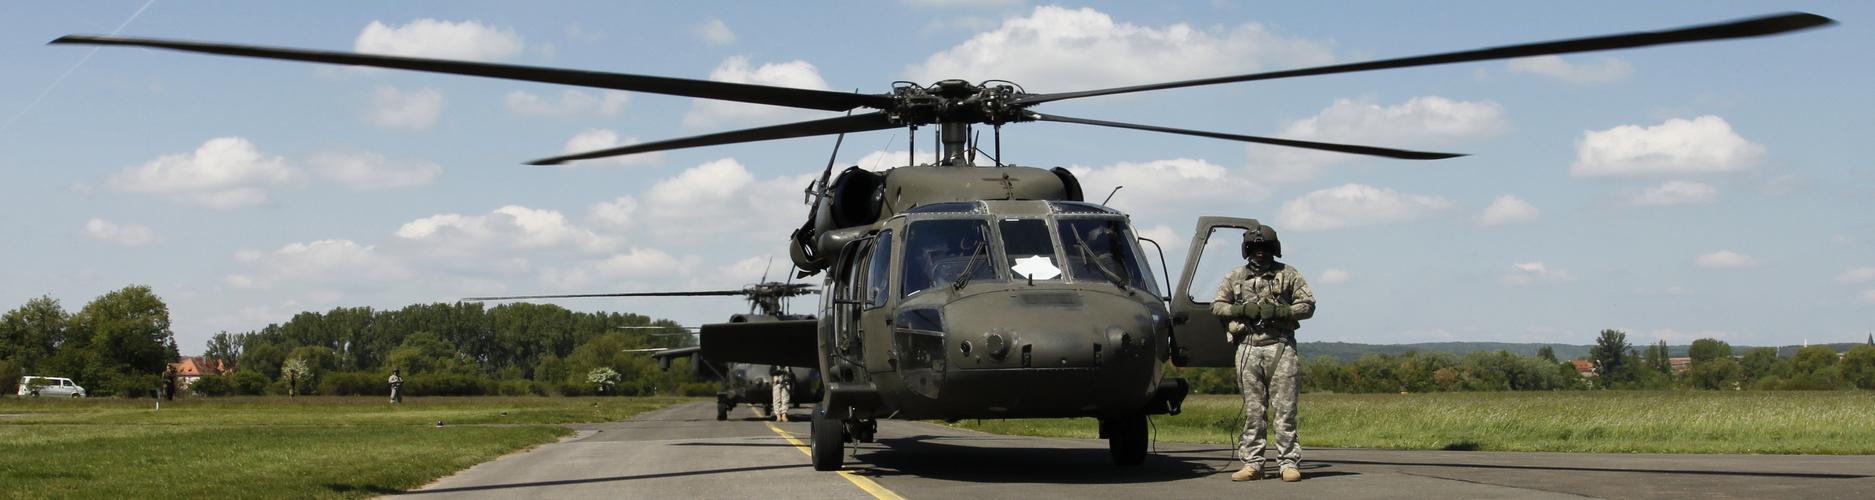 Blackhawk UH-60 in Hassfurt